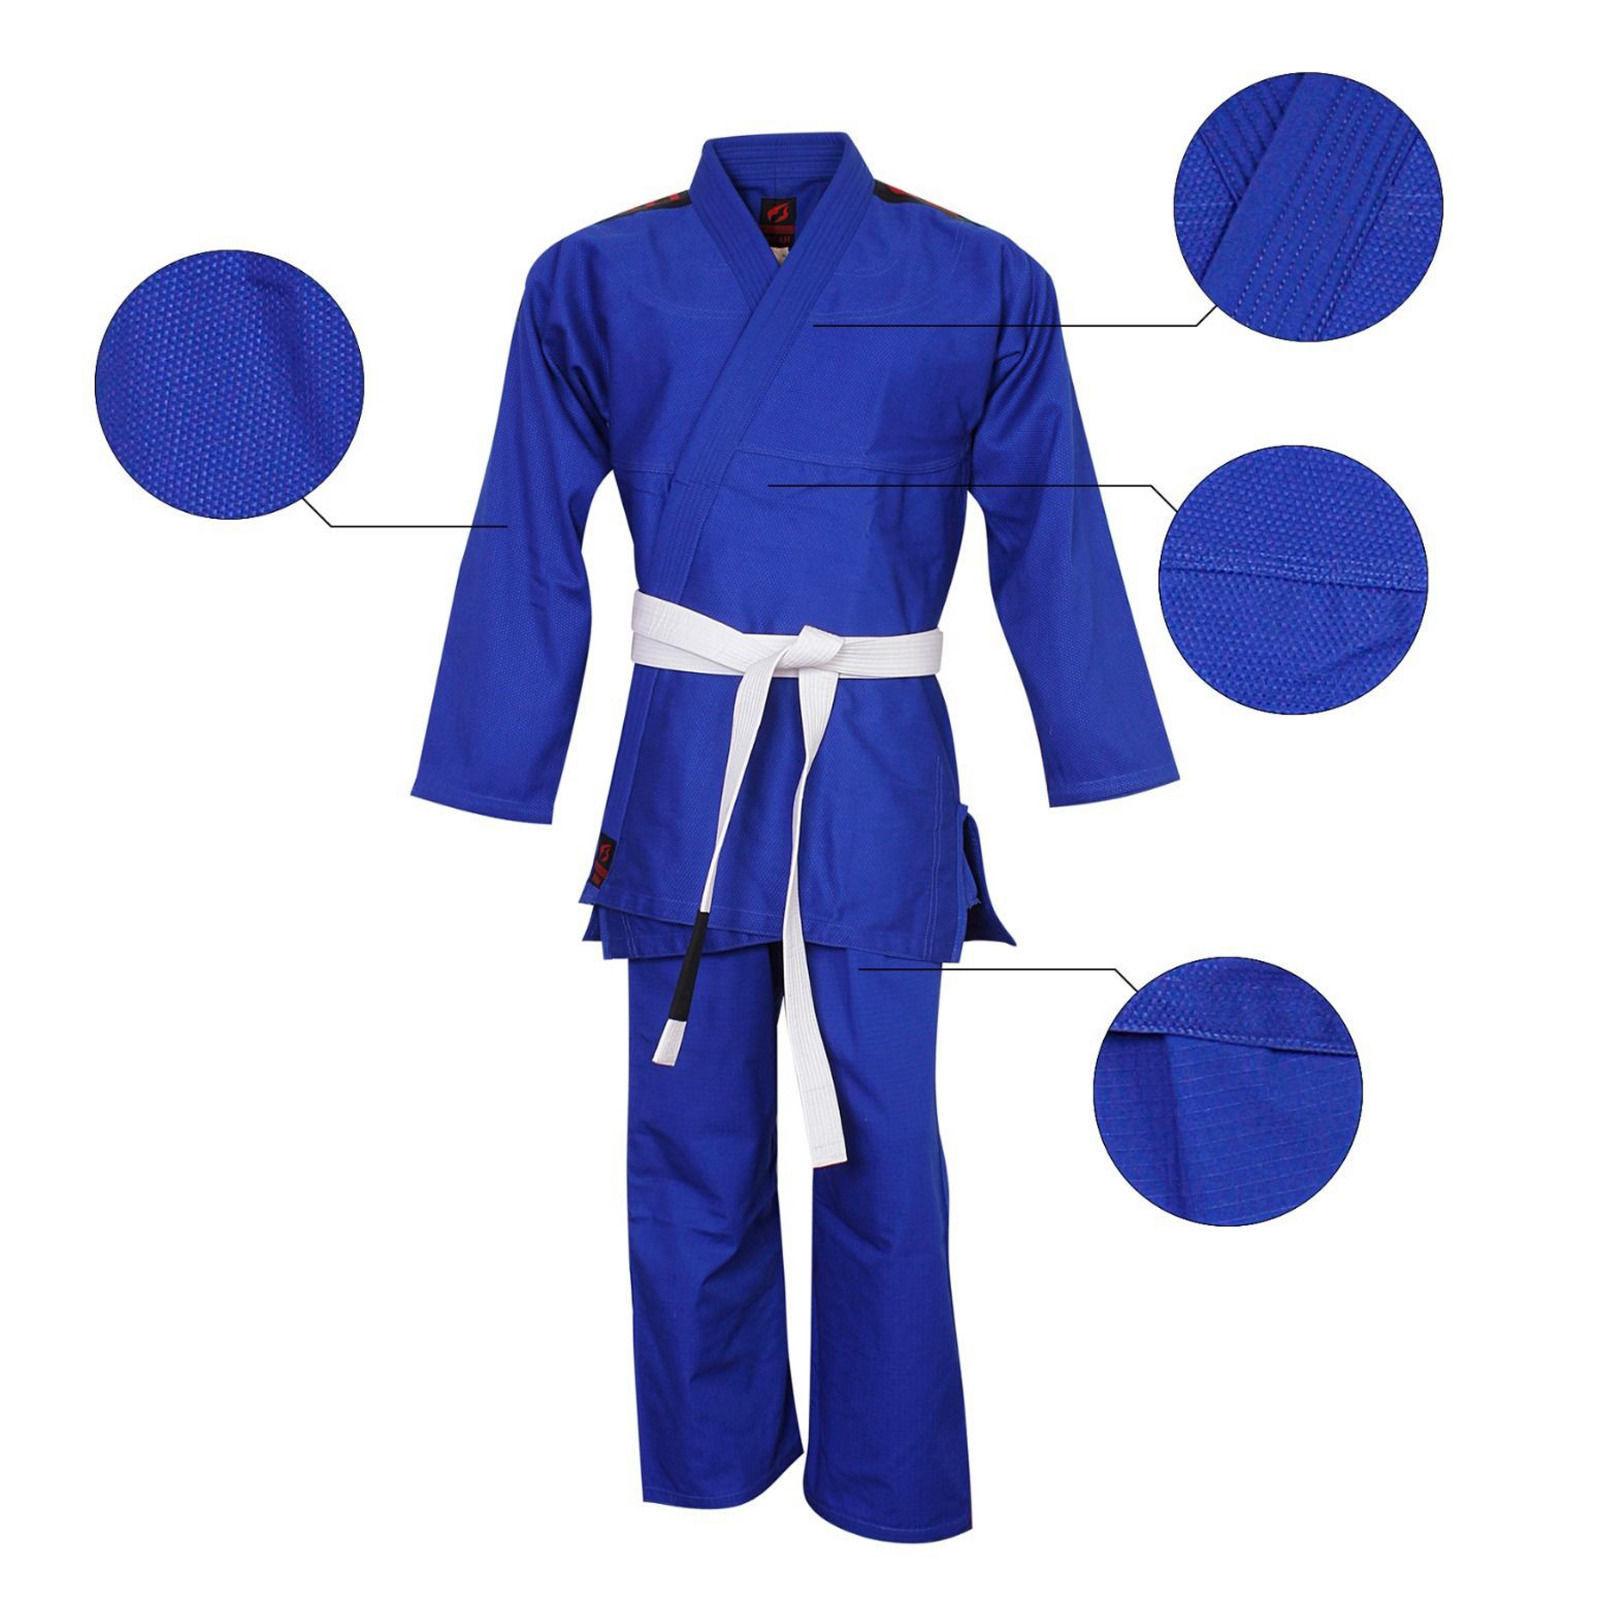 Martial Art Jiu Jitsu Gi Suit Top Quality Pro Design Suit Uniform blueee Free Belt